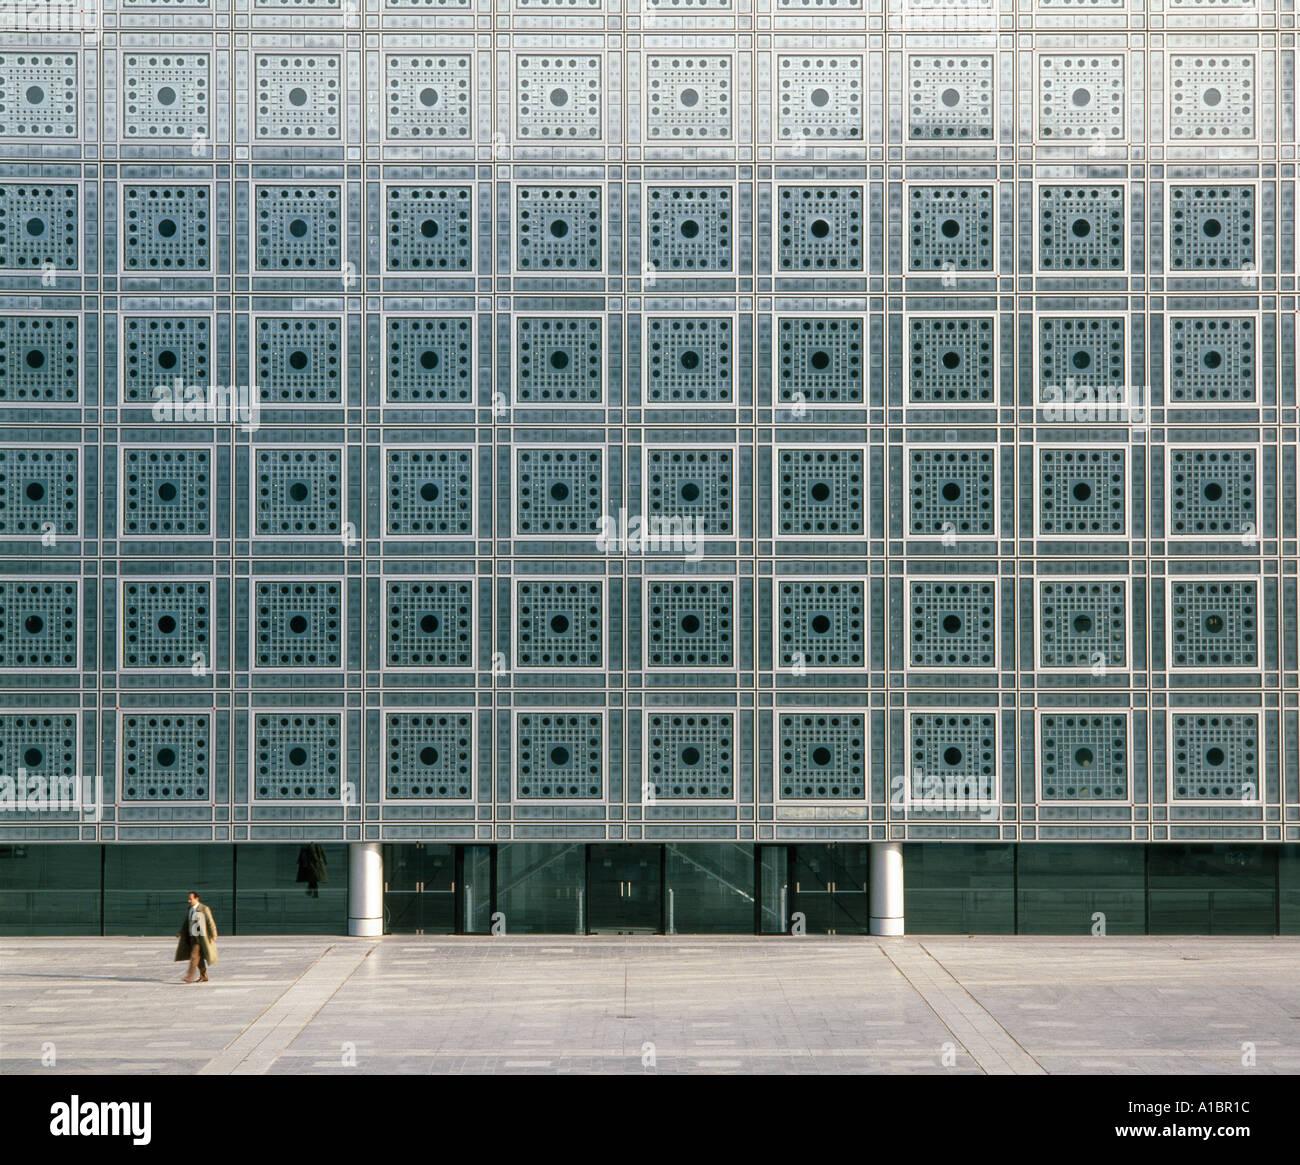 Institut du Monde Arabe, facciata sud, Parigi, 1987. Finestra fotosensibile schermate. Architetto: Jean Nouvel Foto Stock